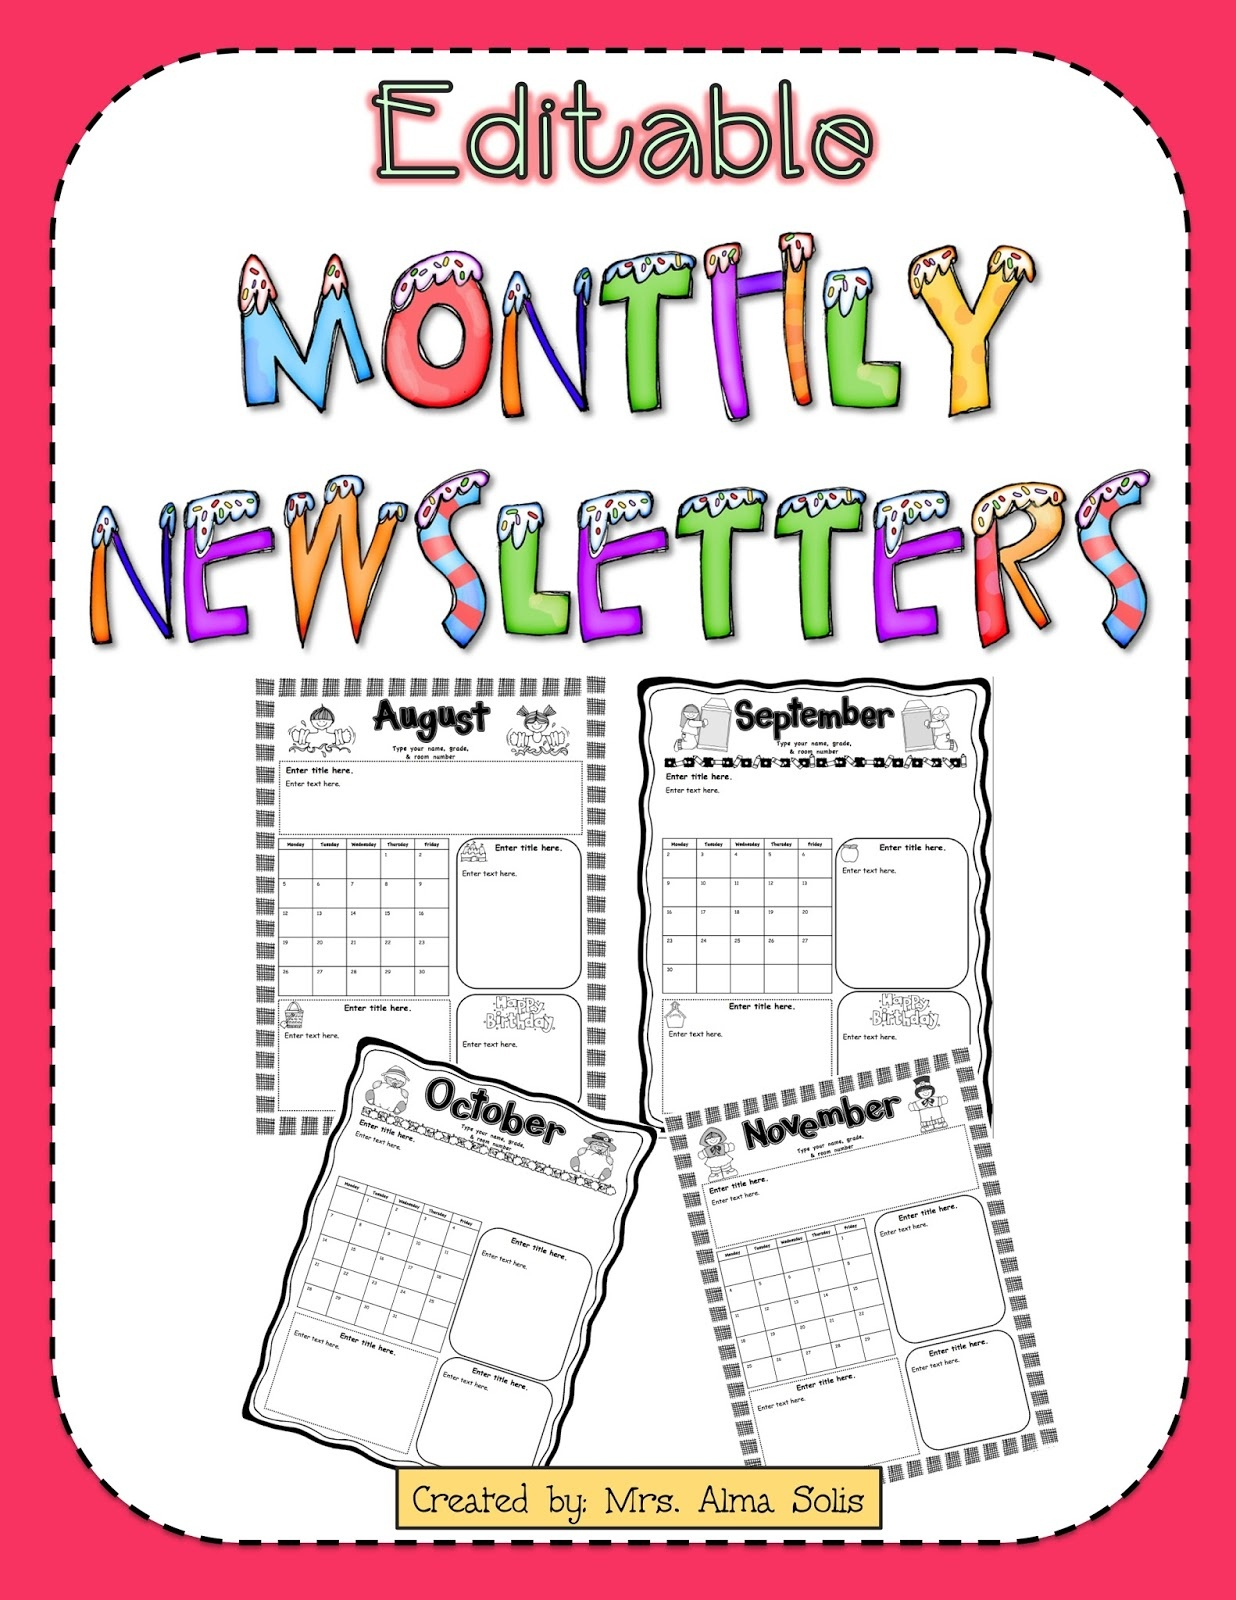 011 Newsletter Templates For Teachers Monthly Template Fresh - Free Printable Kindergarten Newsletter Templates